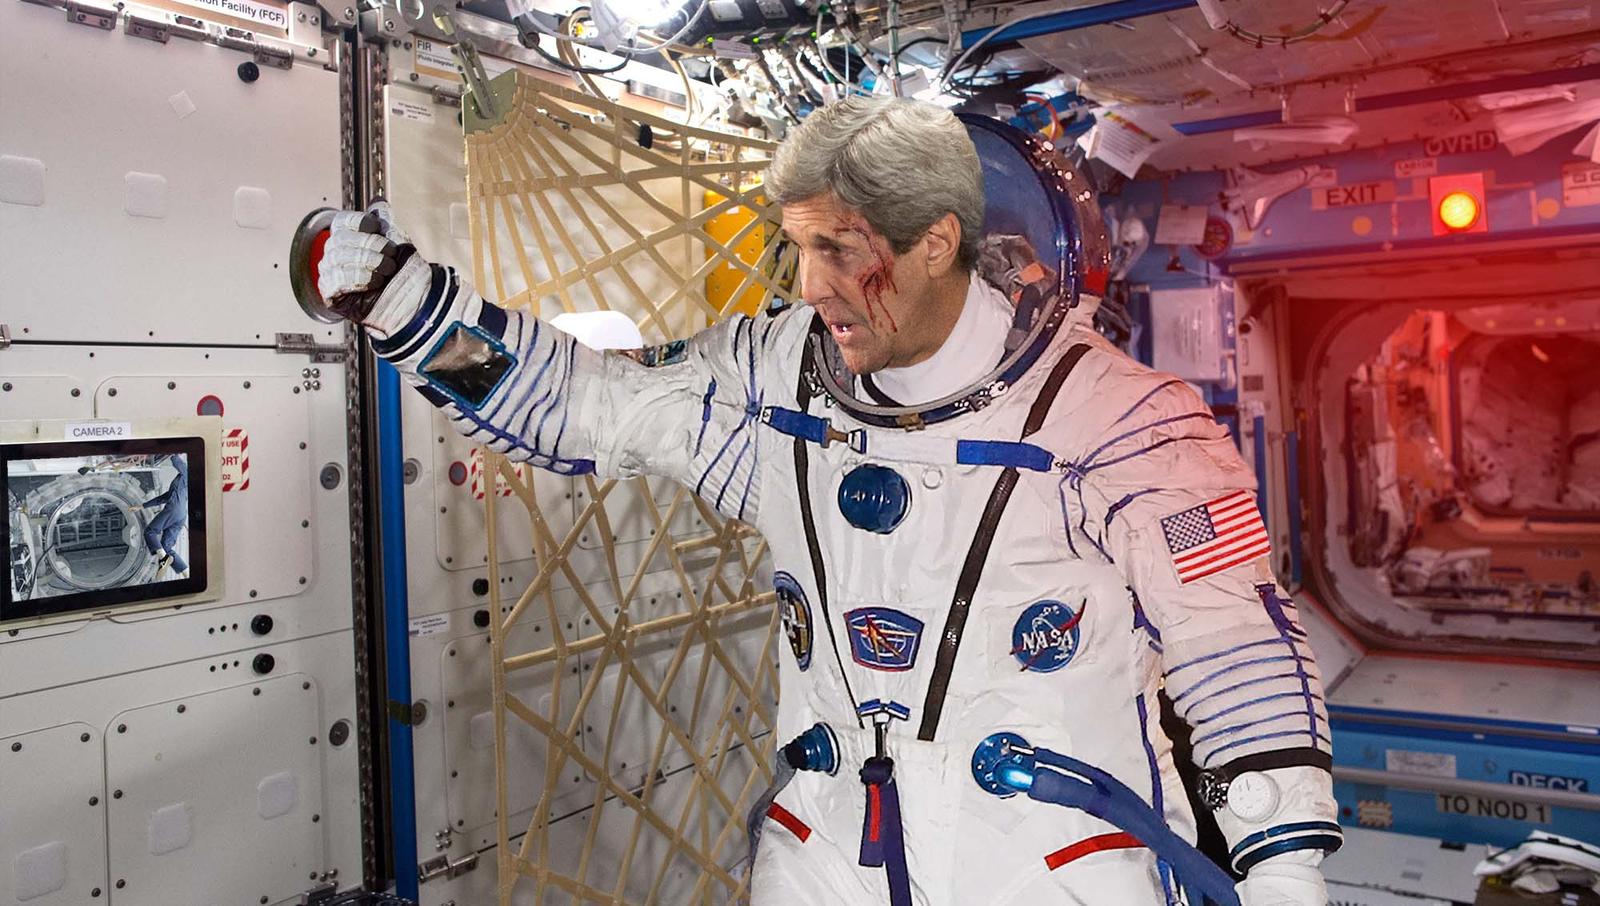 John Kerry Jettisons Russian Henchmen From International Space Station Airlock